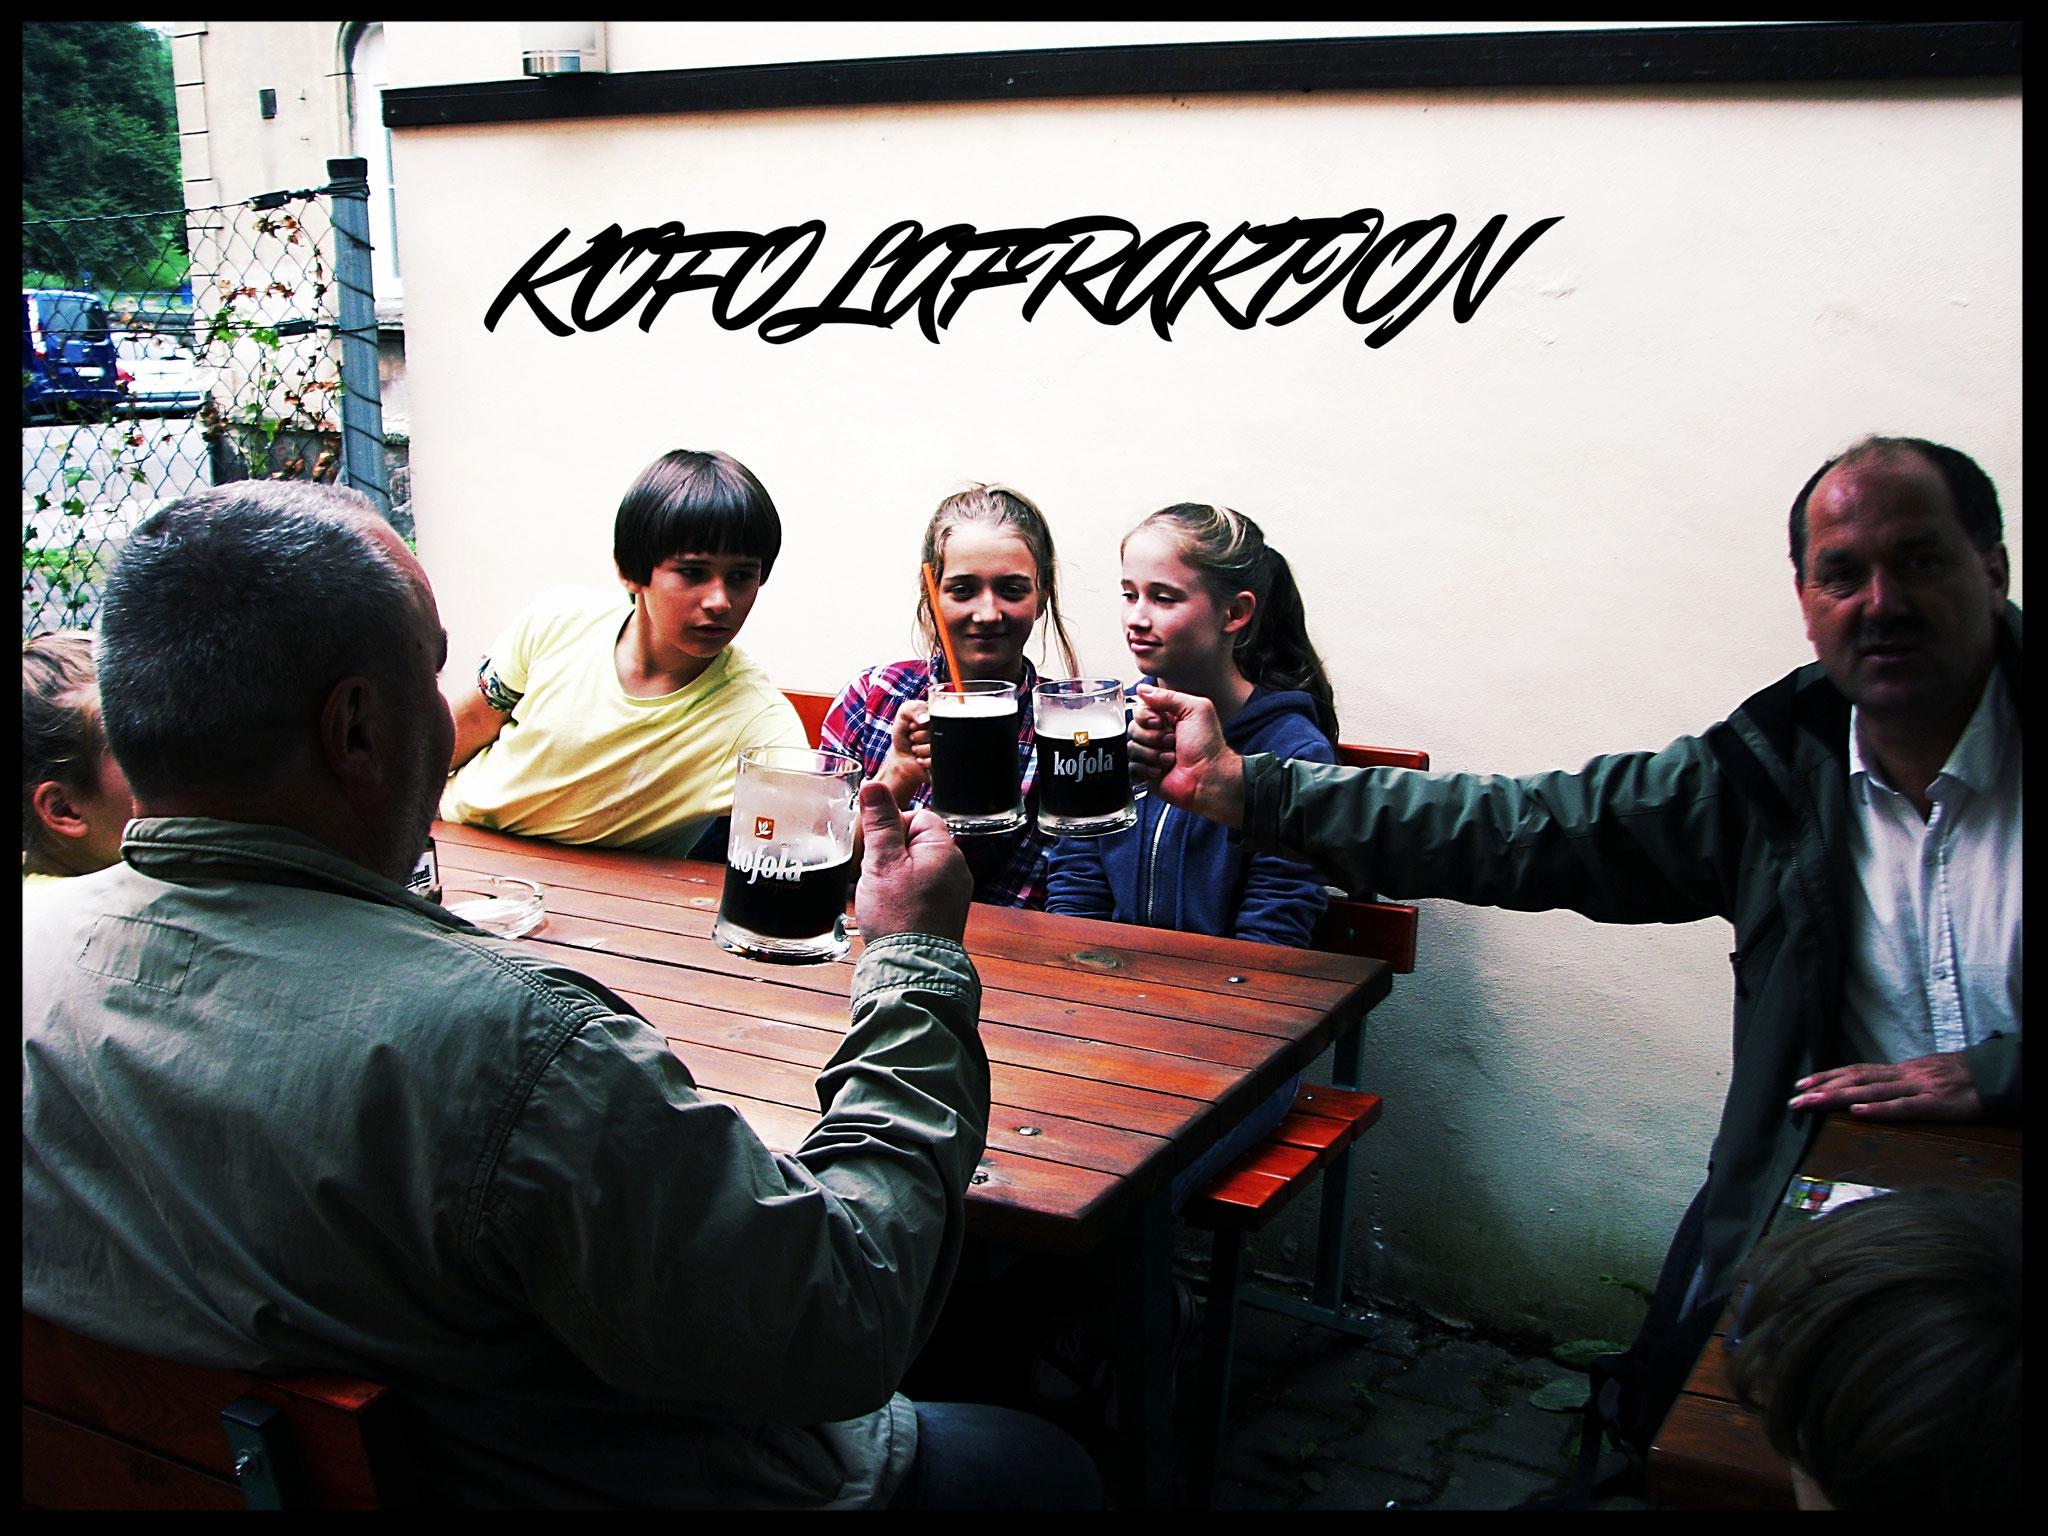 Die Kofola Fraktion